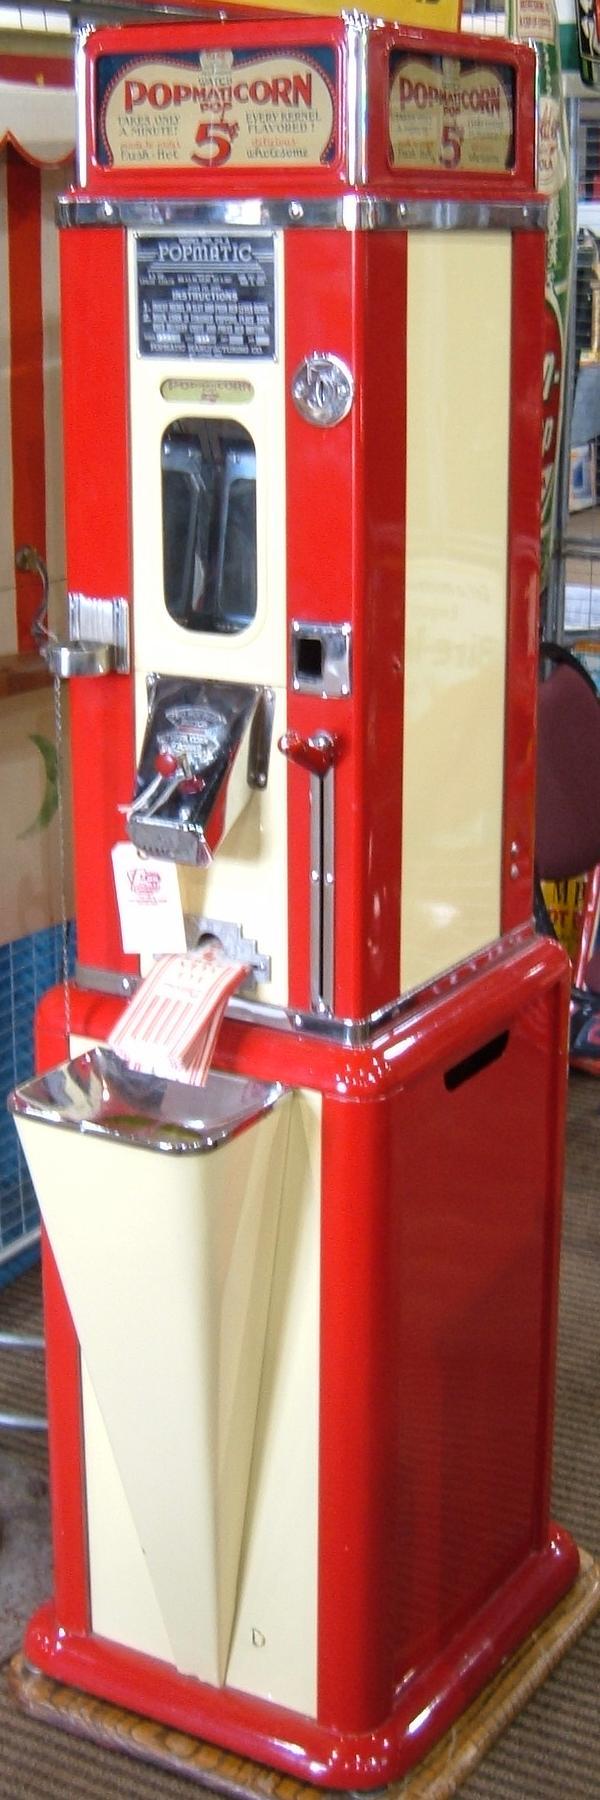 Popcorn Machines Minit Pop U It Popmaticorn Shop For Machine Wiring Diagrams O Matic Corn Coin Operated